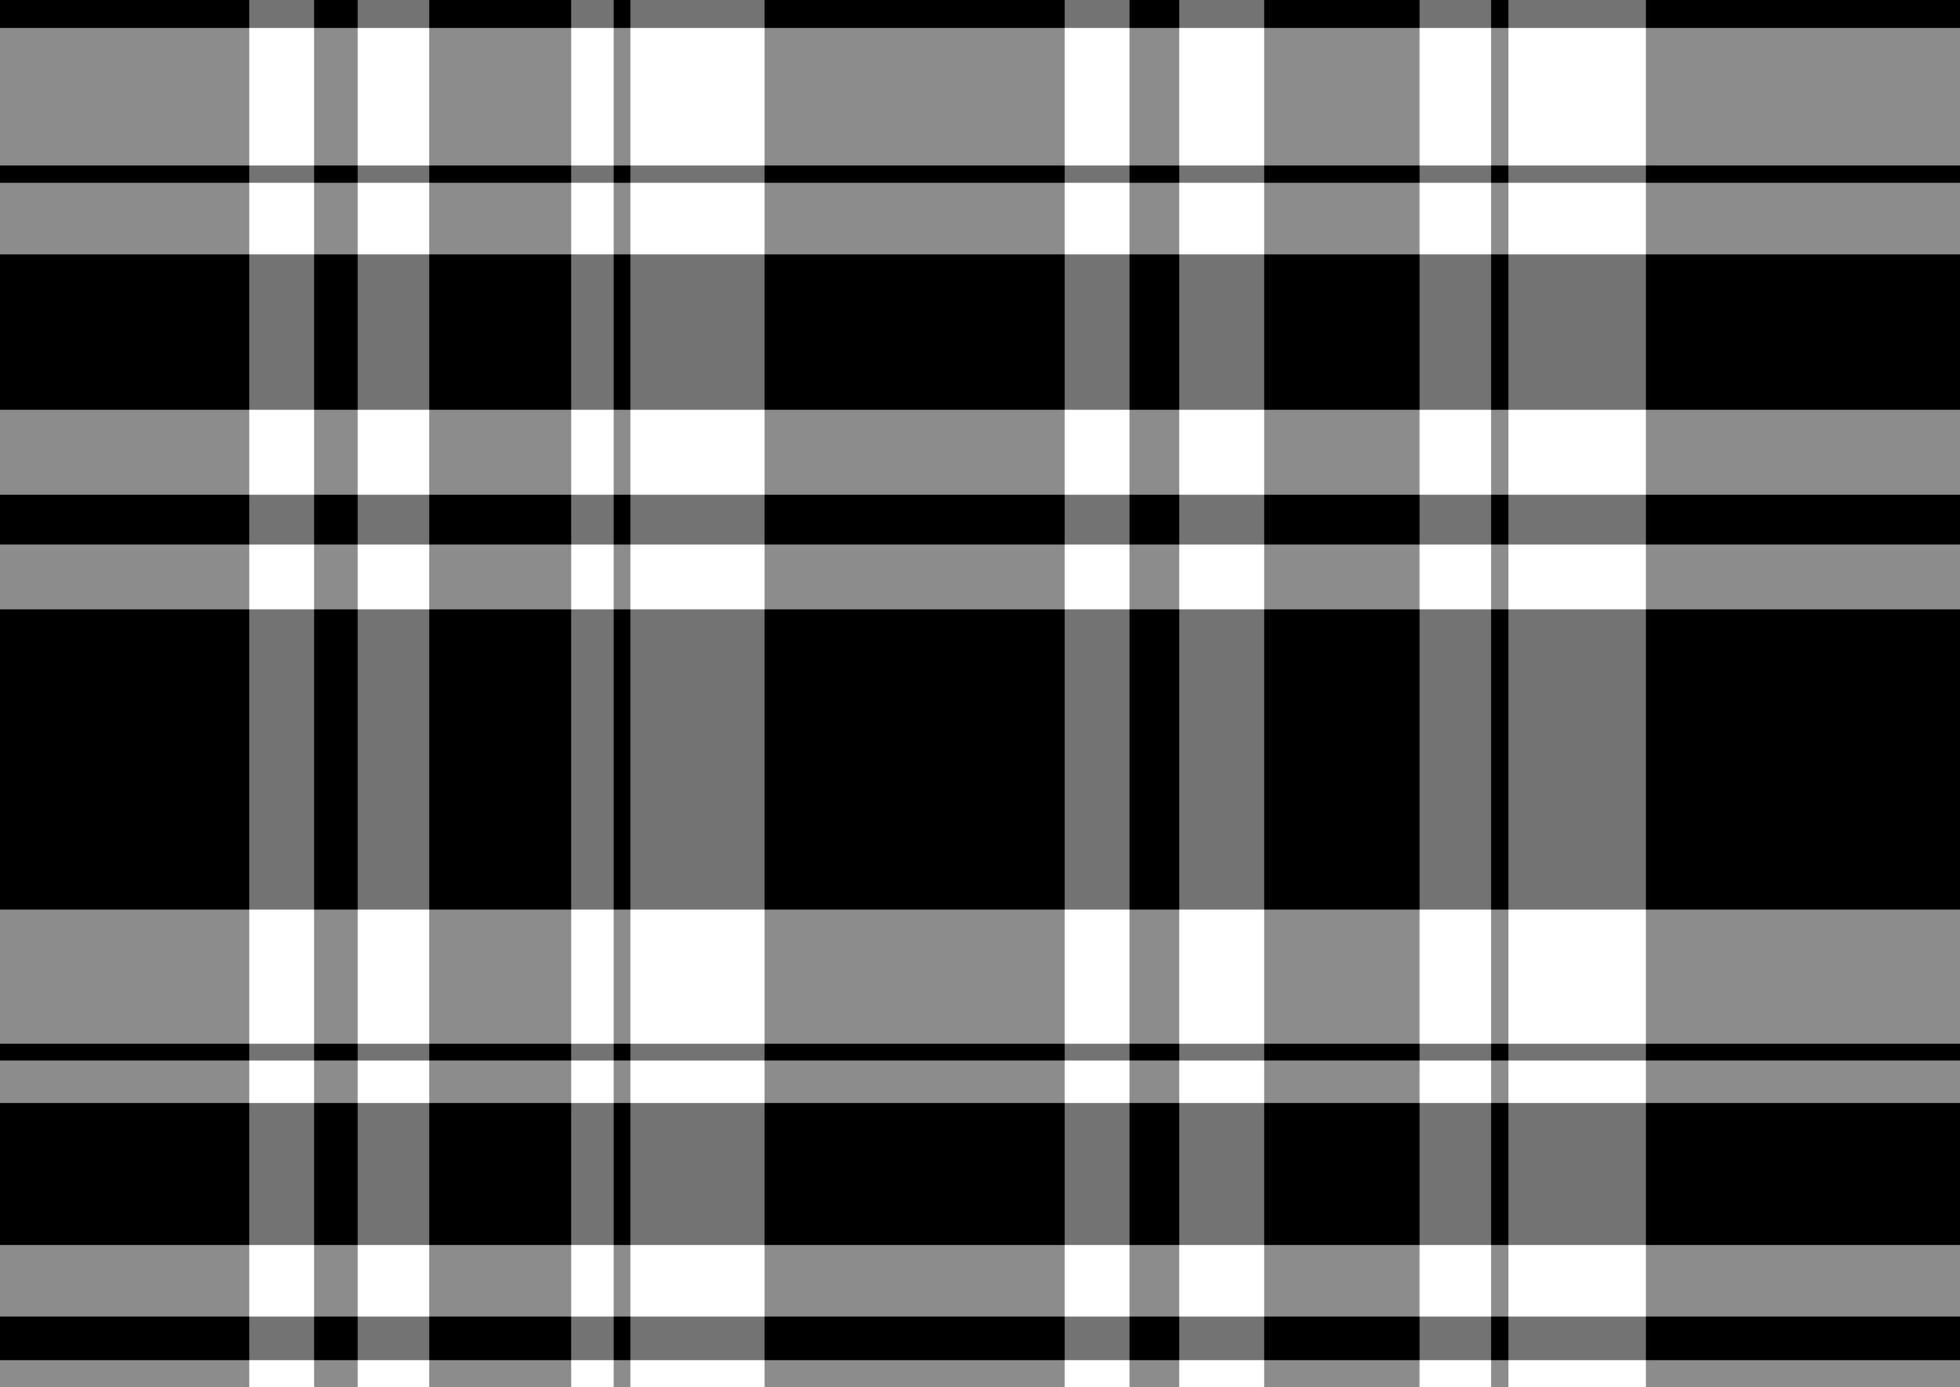 Black & White Checkered Wallpaper - WallpaperSafari